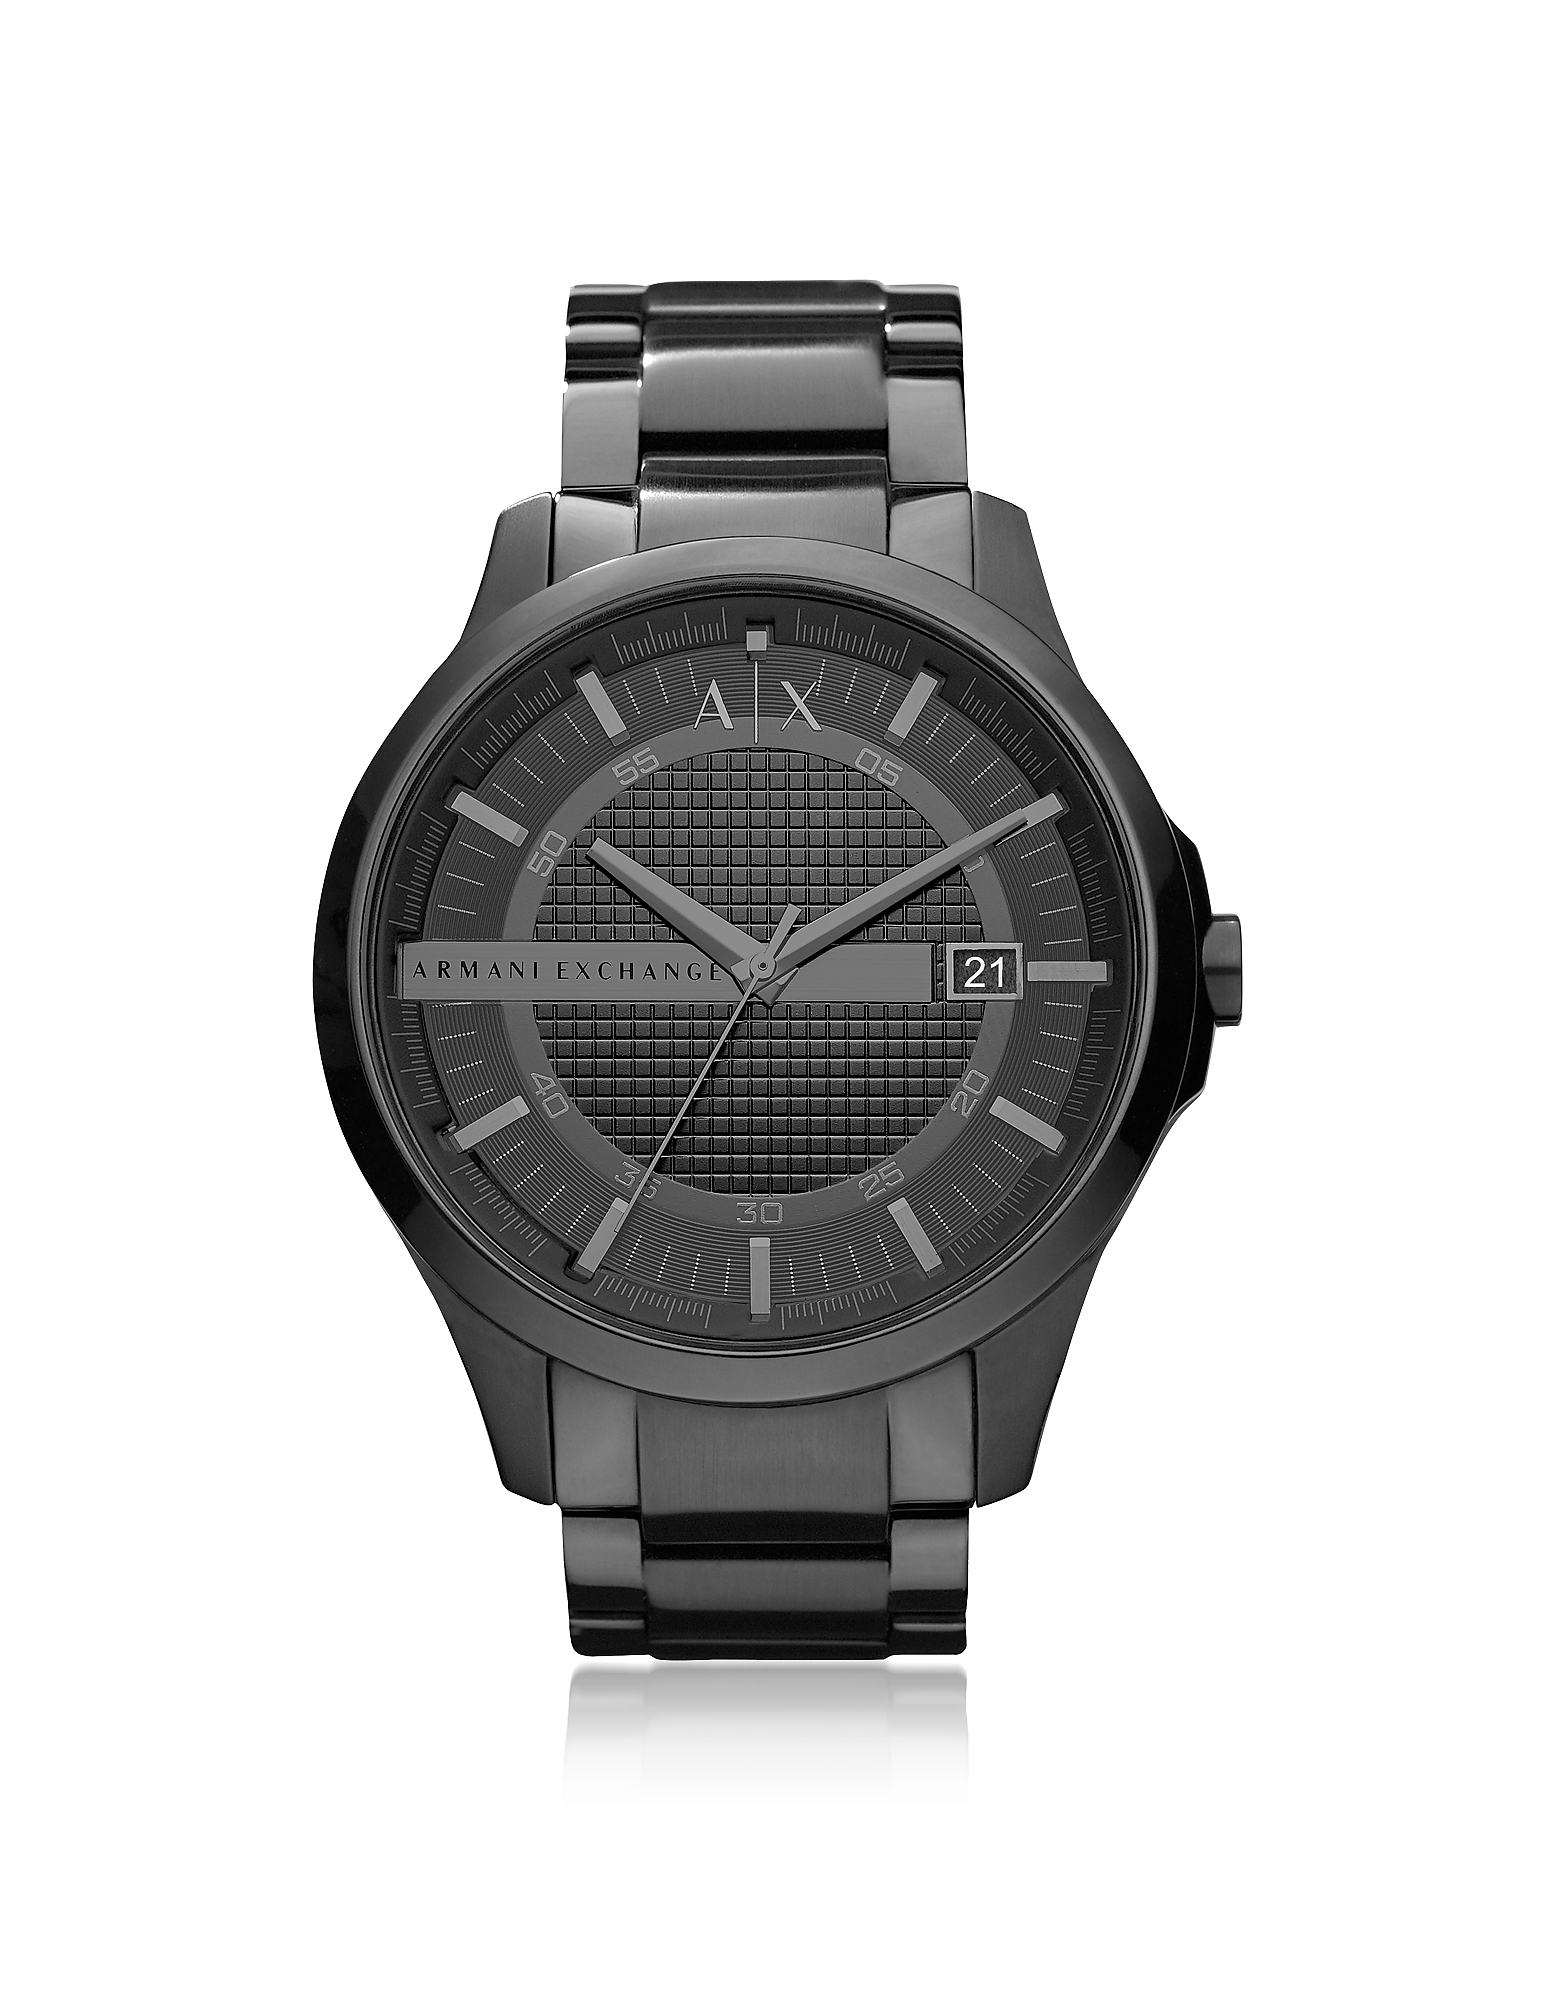 Armani Exchange Men's Watches, Hampton Black Stainless Steel Men's Watch